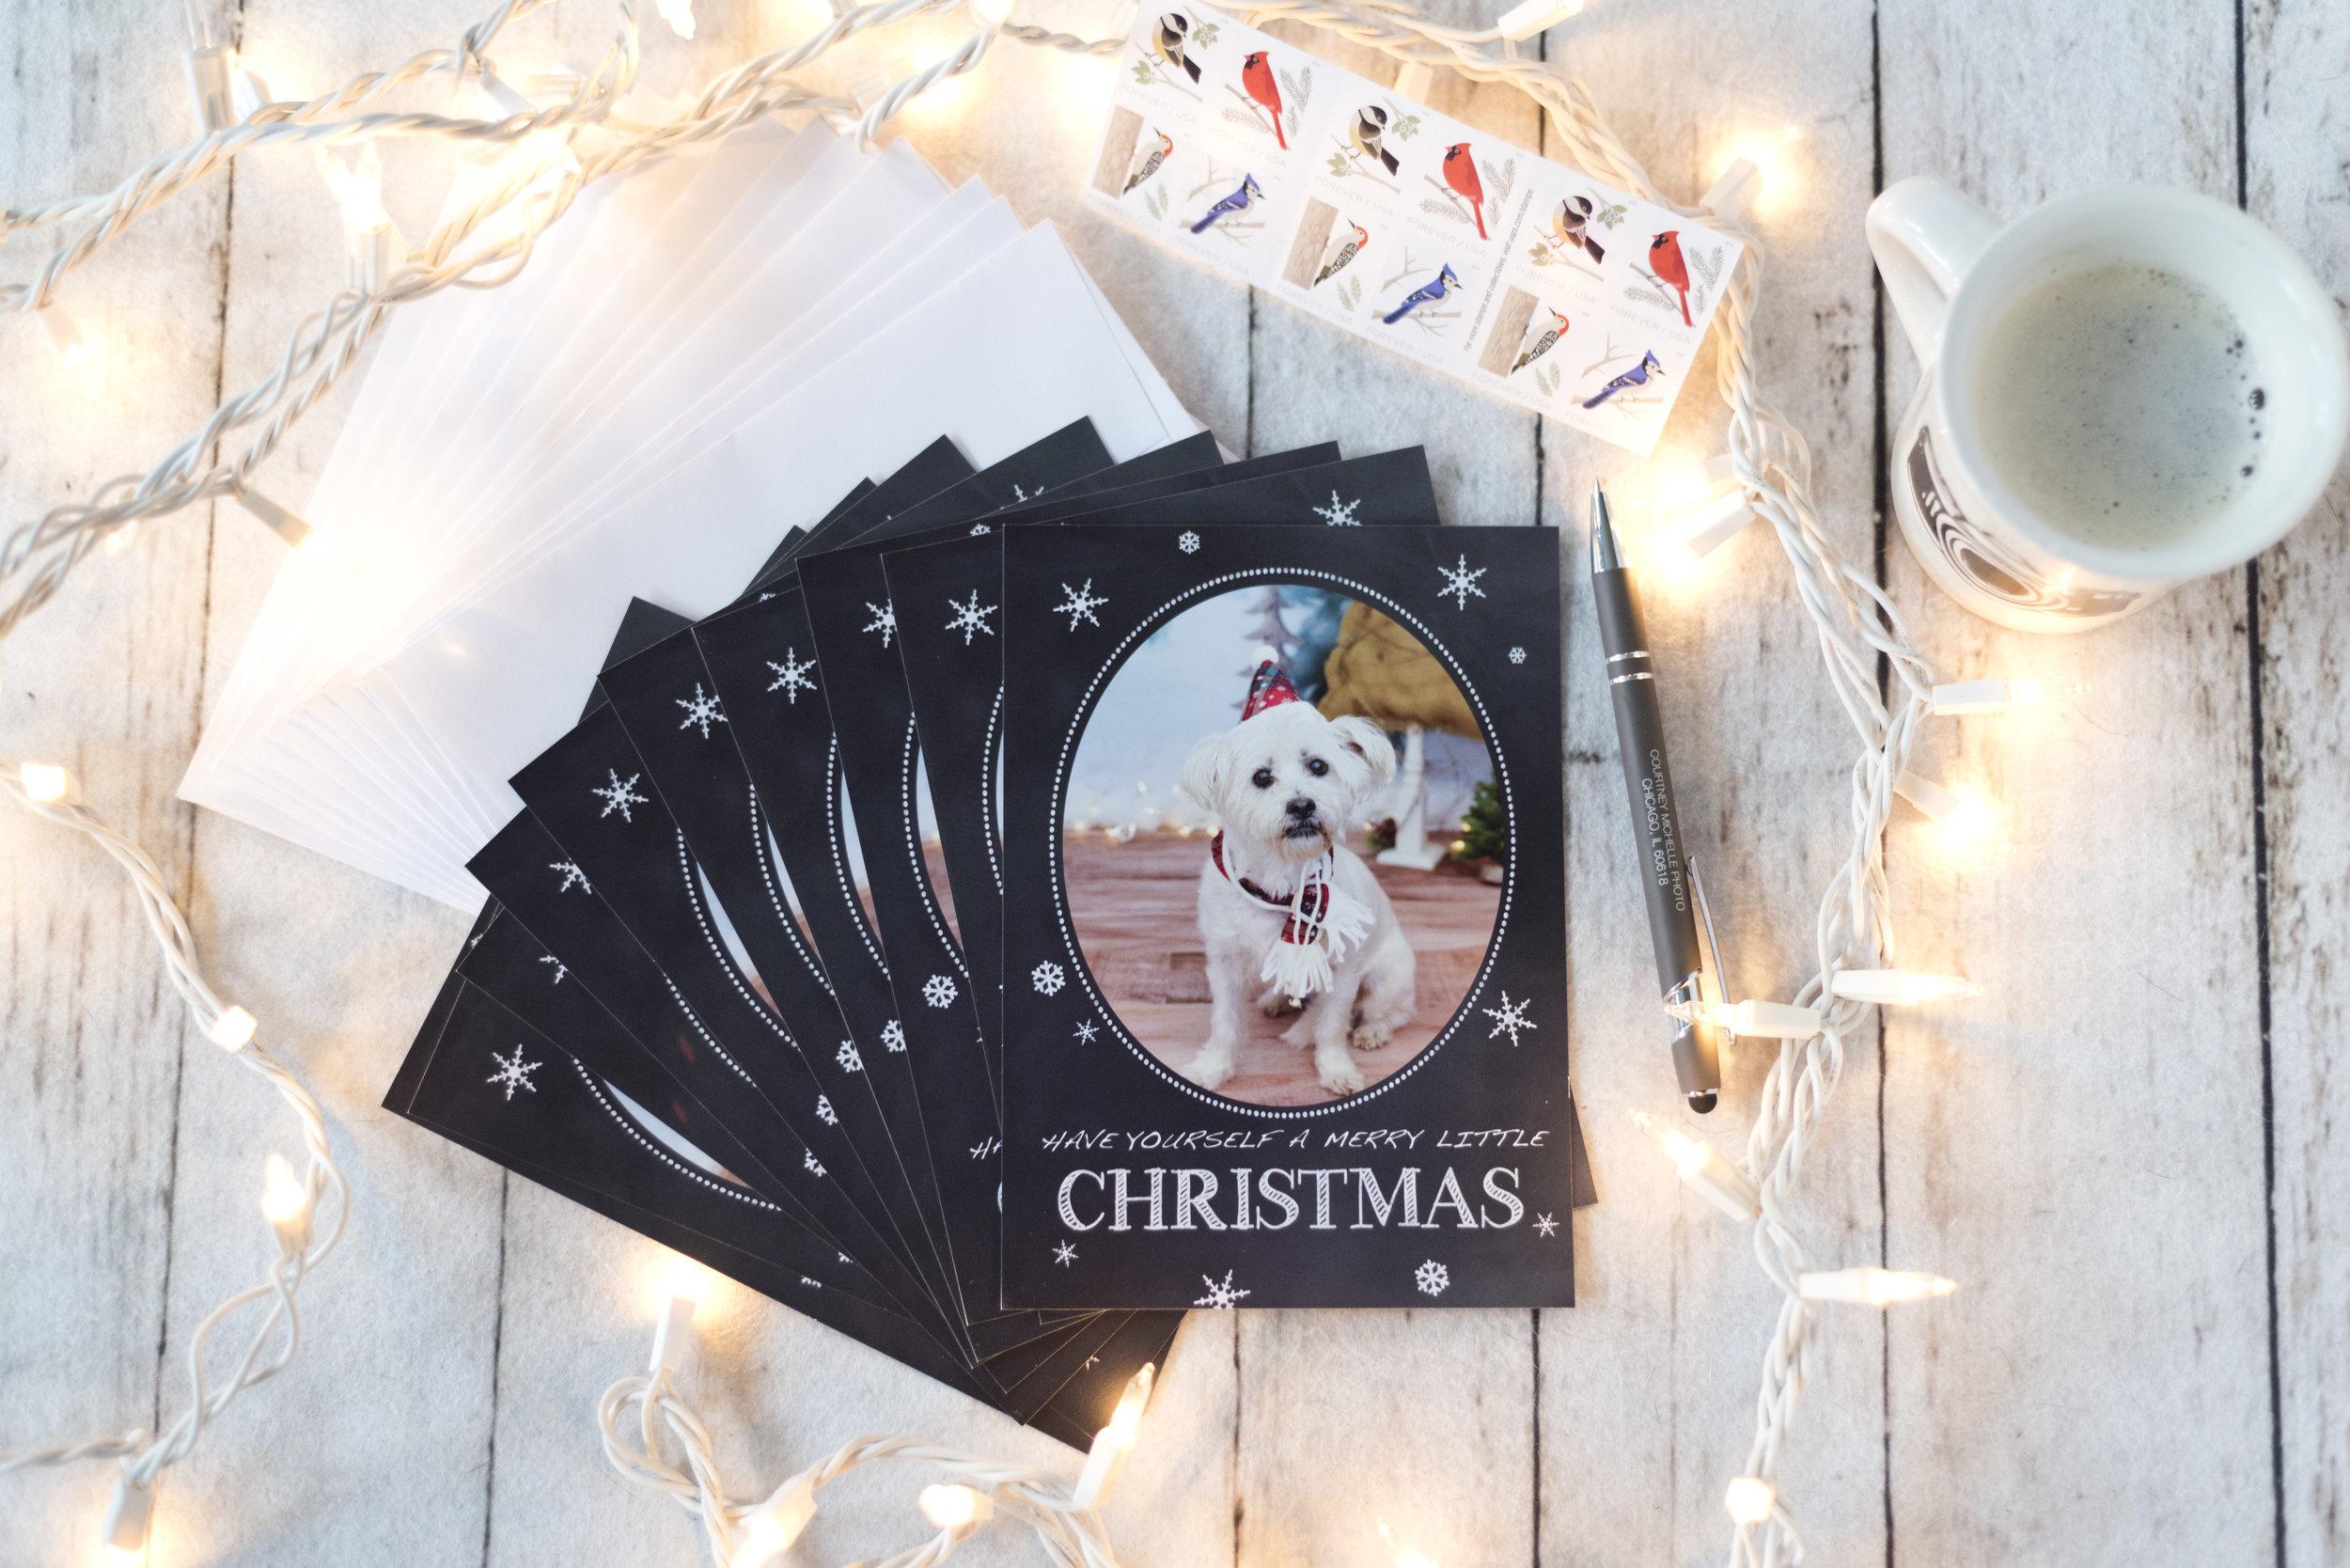 christmas-cards©COPYRIGHTCMP-2018-ChristmasCards-7878.jpg